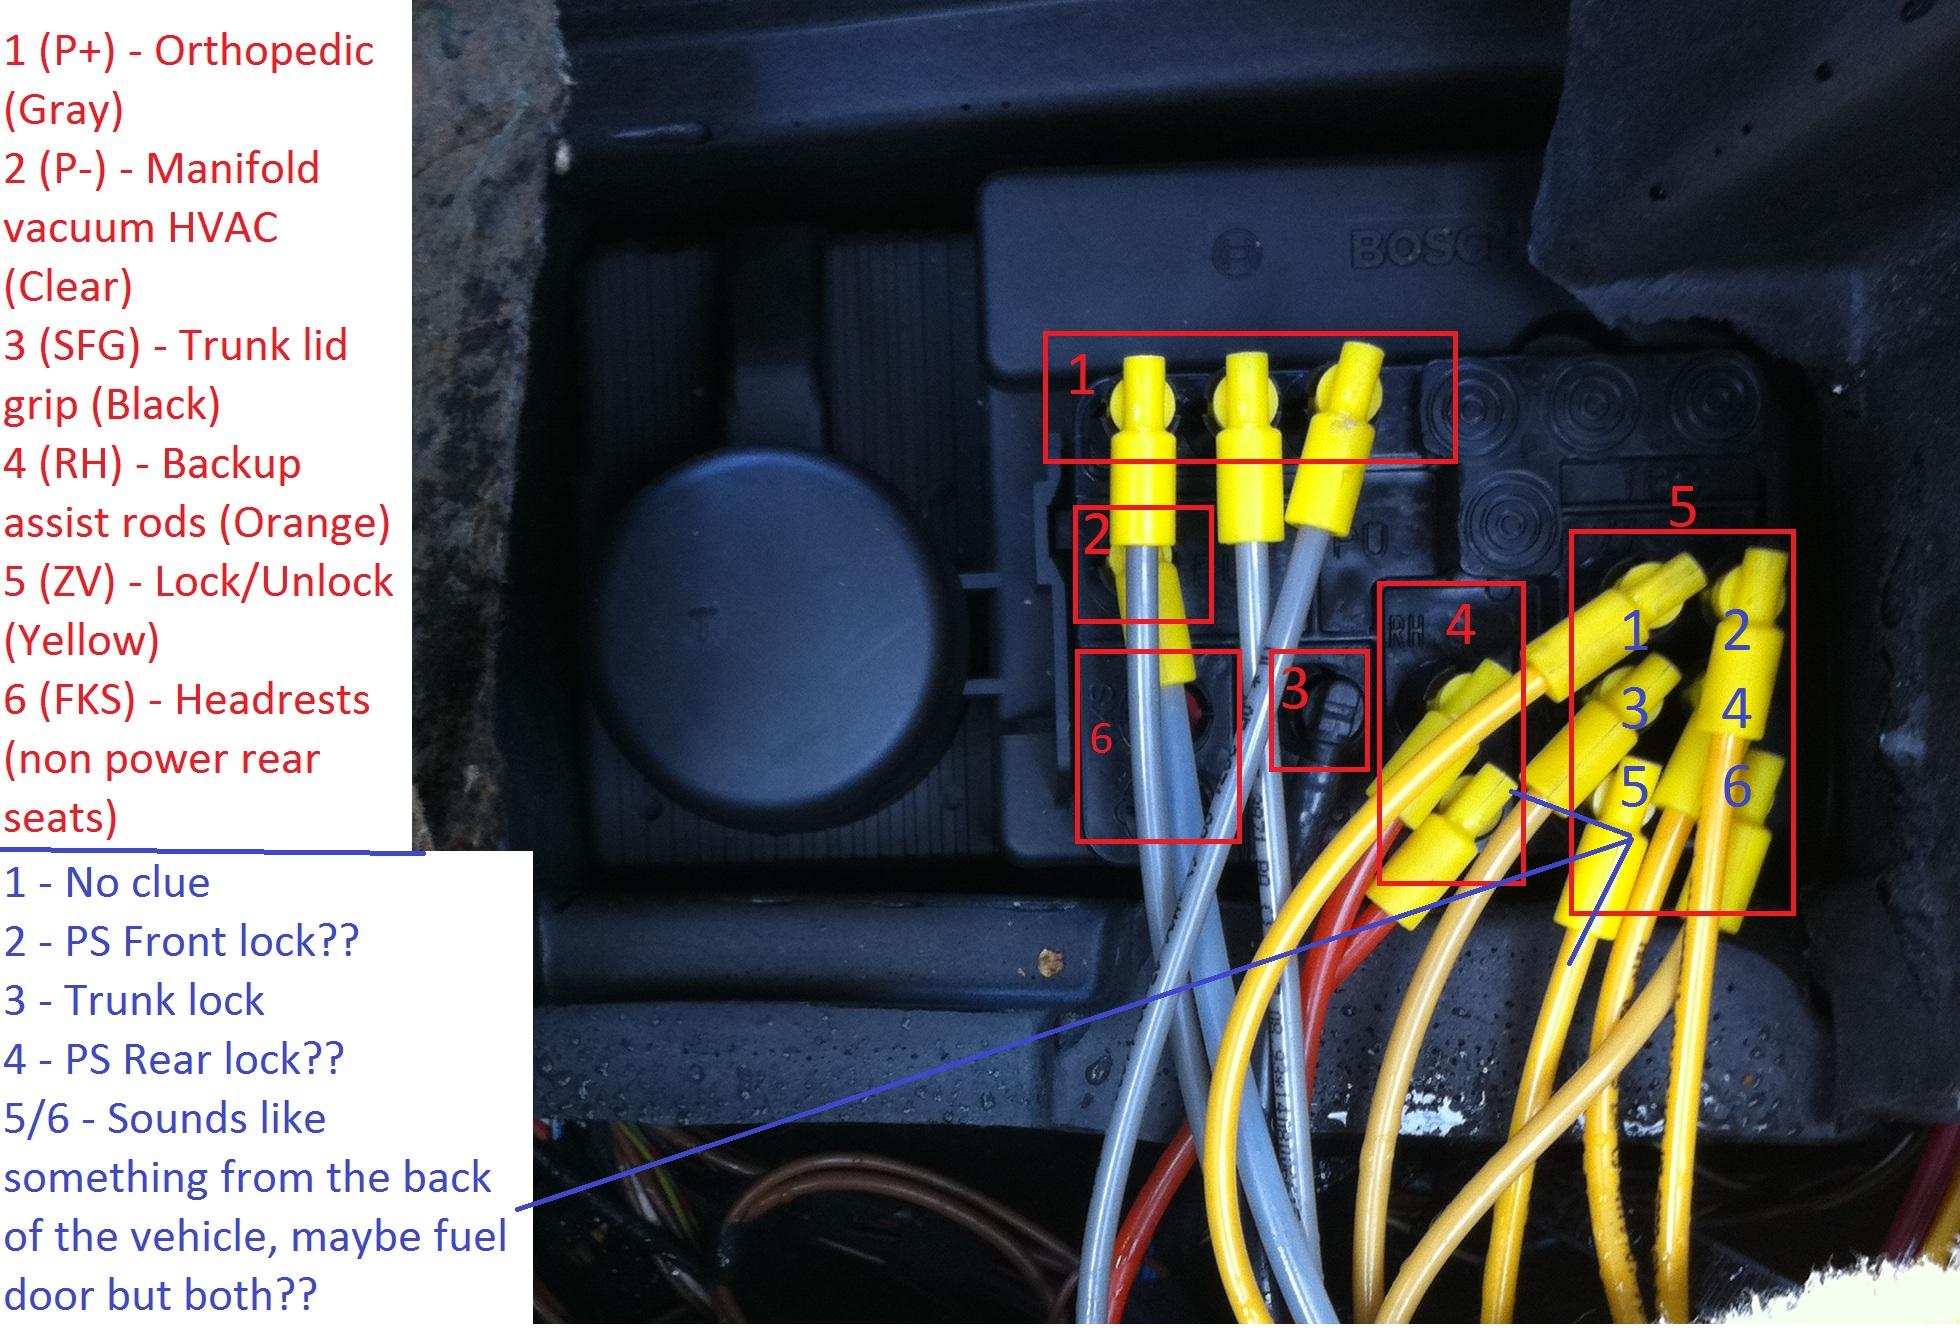 1995 W140 Starter Wiring Diagram W Mercedes Benz Starter Wiring Diagrams on